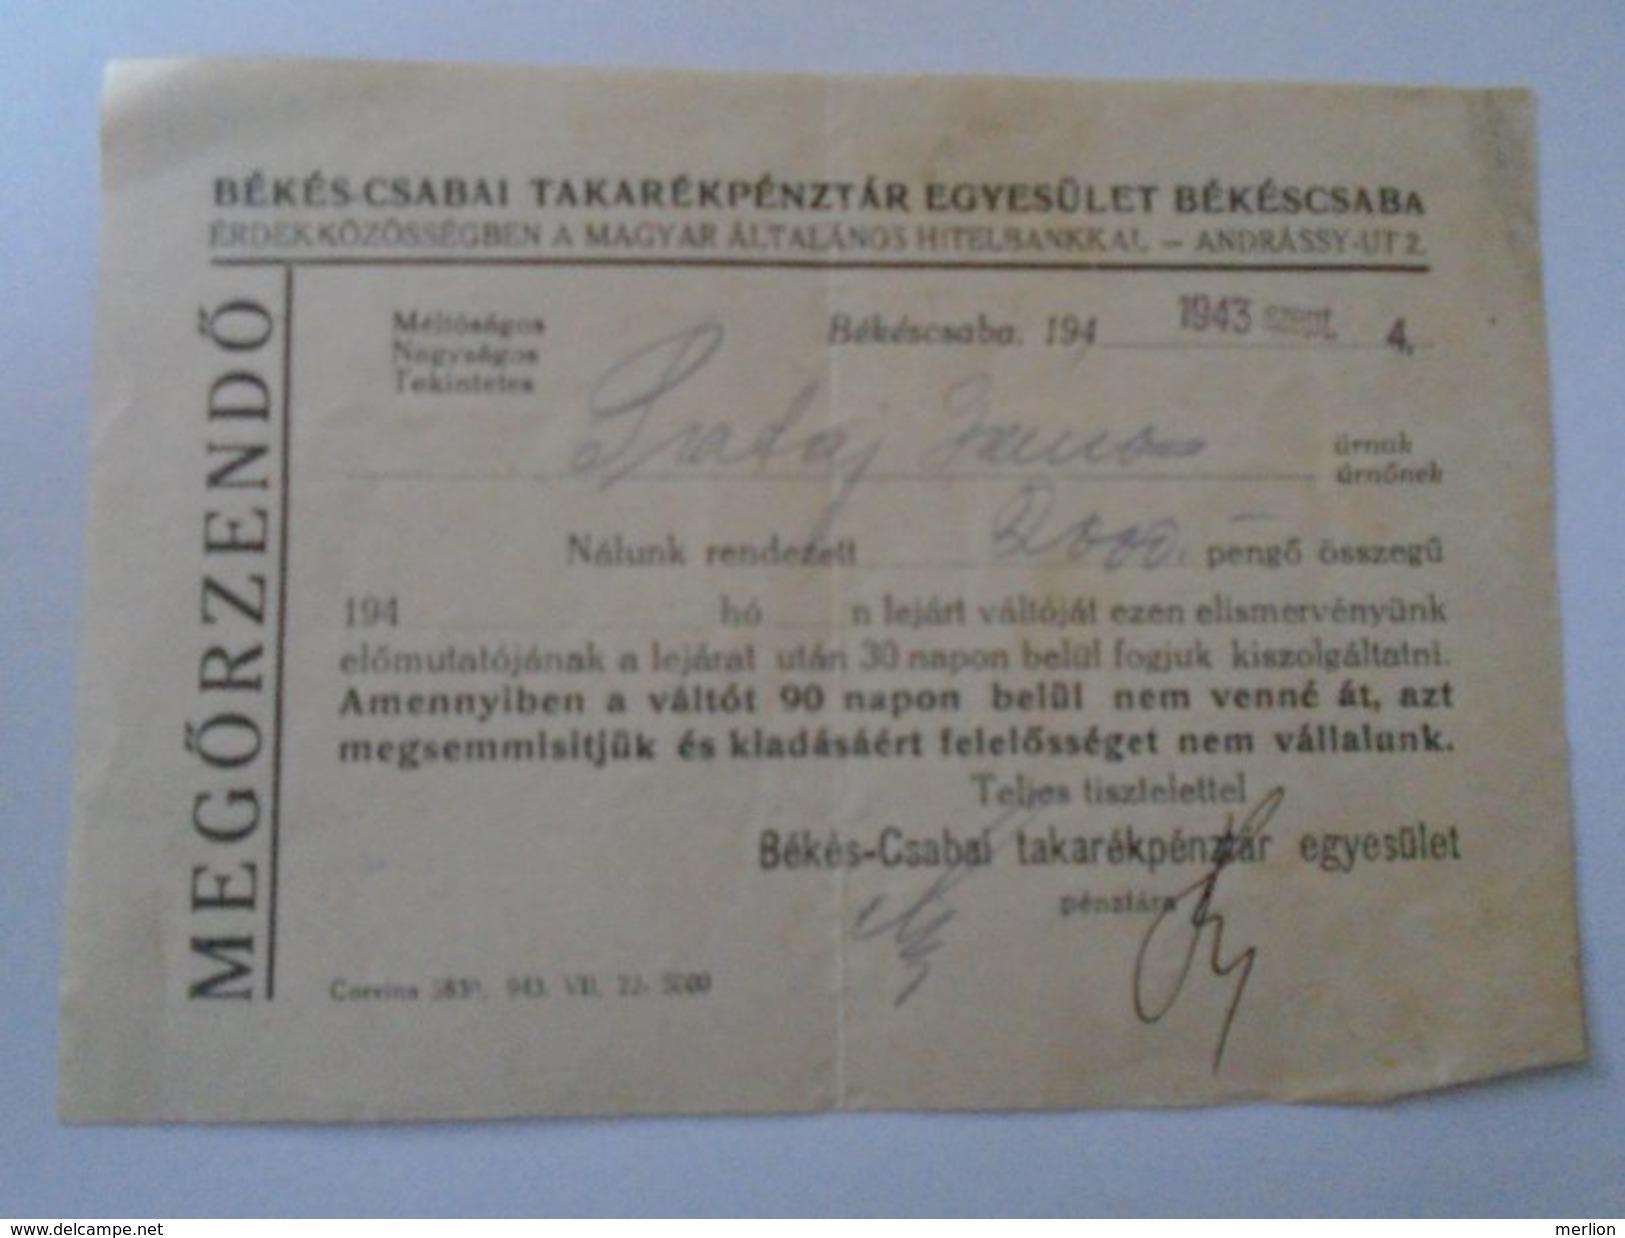 J2049.17 Hungary Békéscsaba Hitelbank  1943  2000 Pengö  - Recepit - Facturas & Documentos Mercantiles